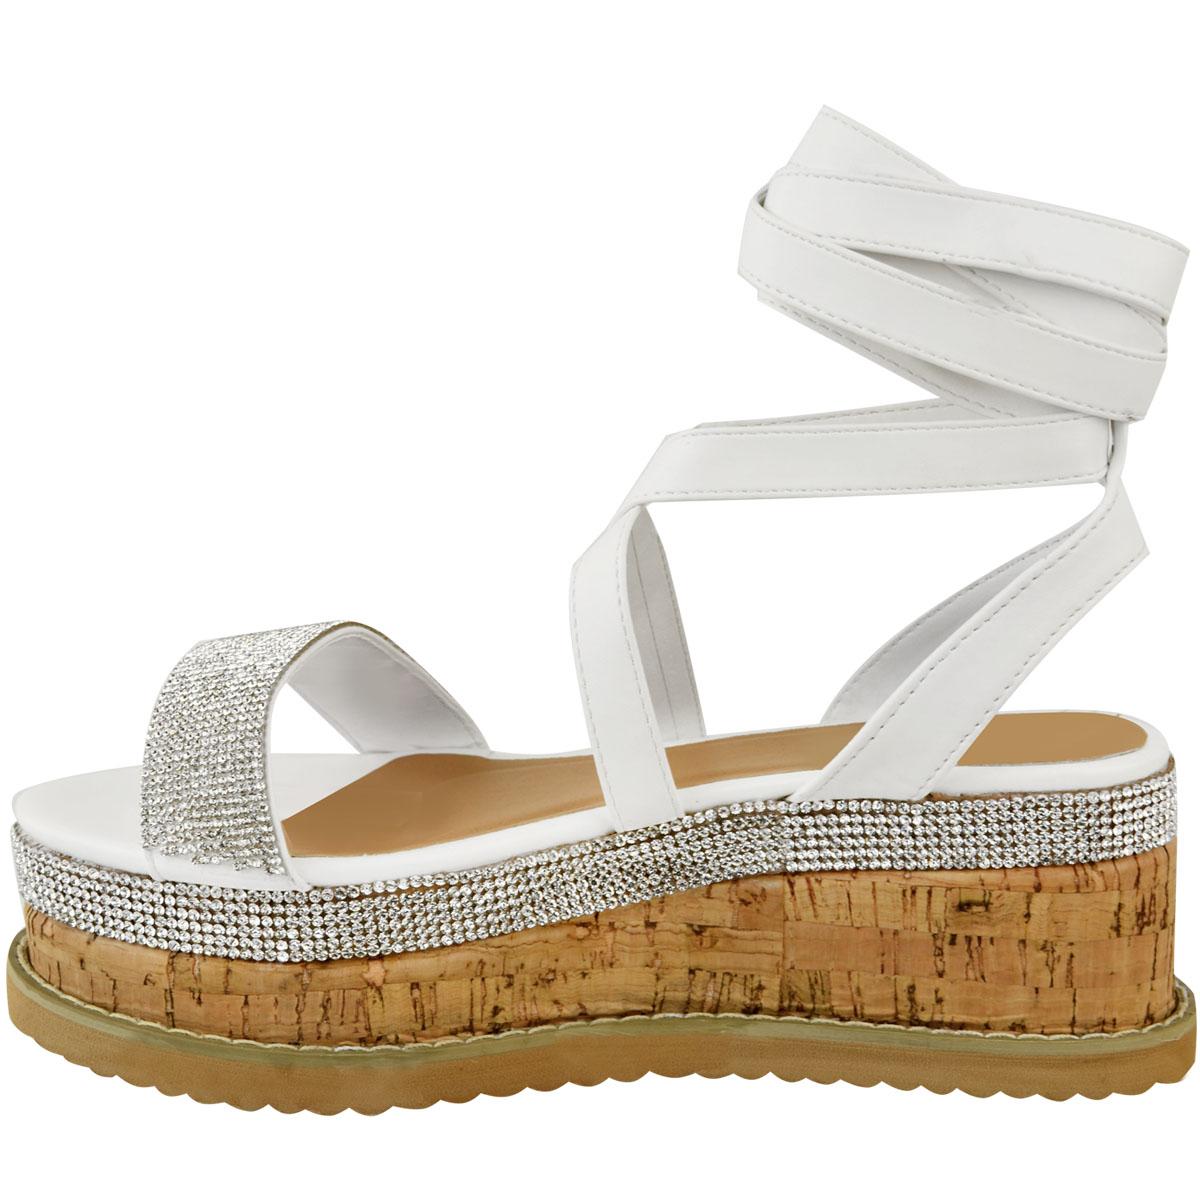 Womens-Ladies-Flatform-Diamante-Wedge-Sandals-Platform-Ankle-Lace-Up-Summer-Size thumbnail 15